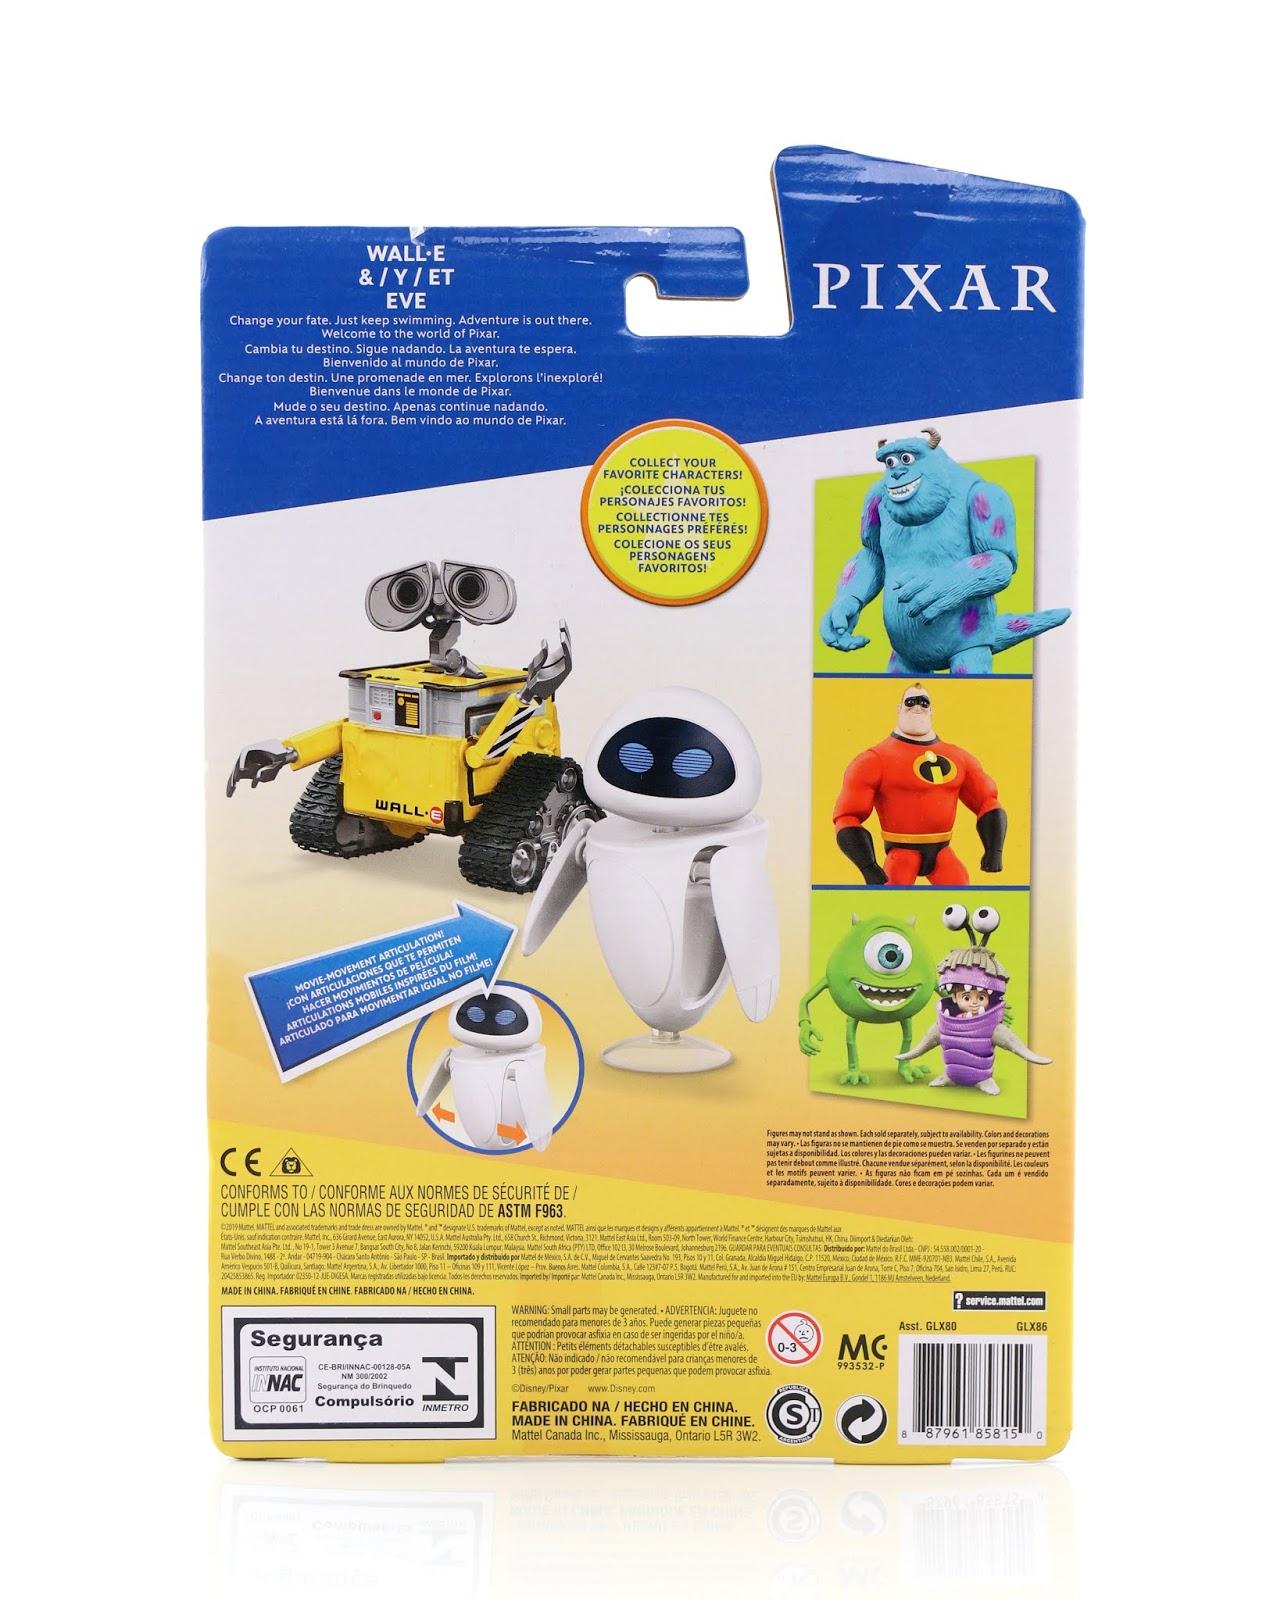 mattel pixar action figures wall-e